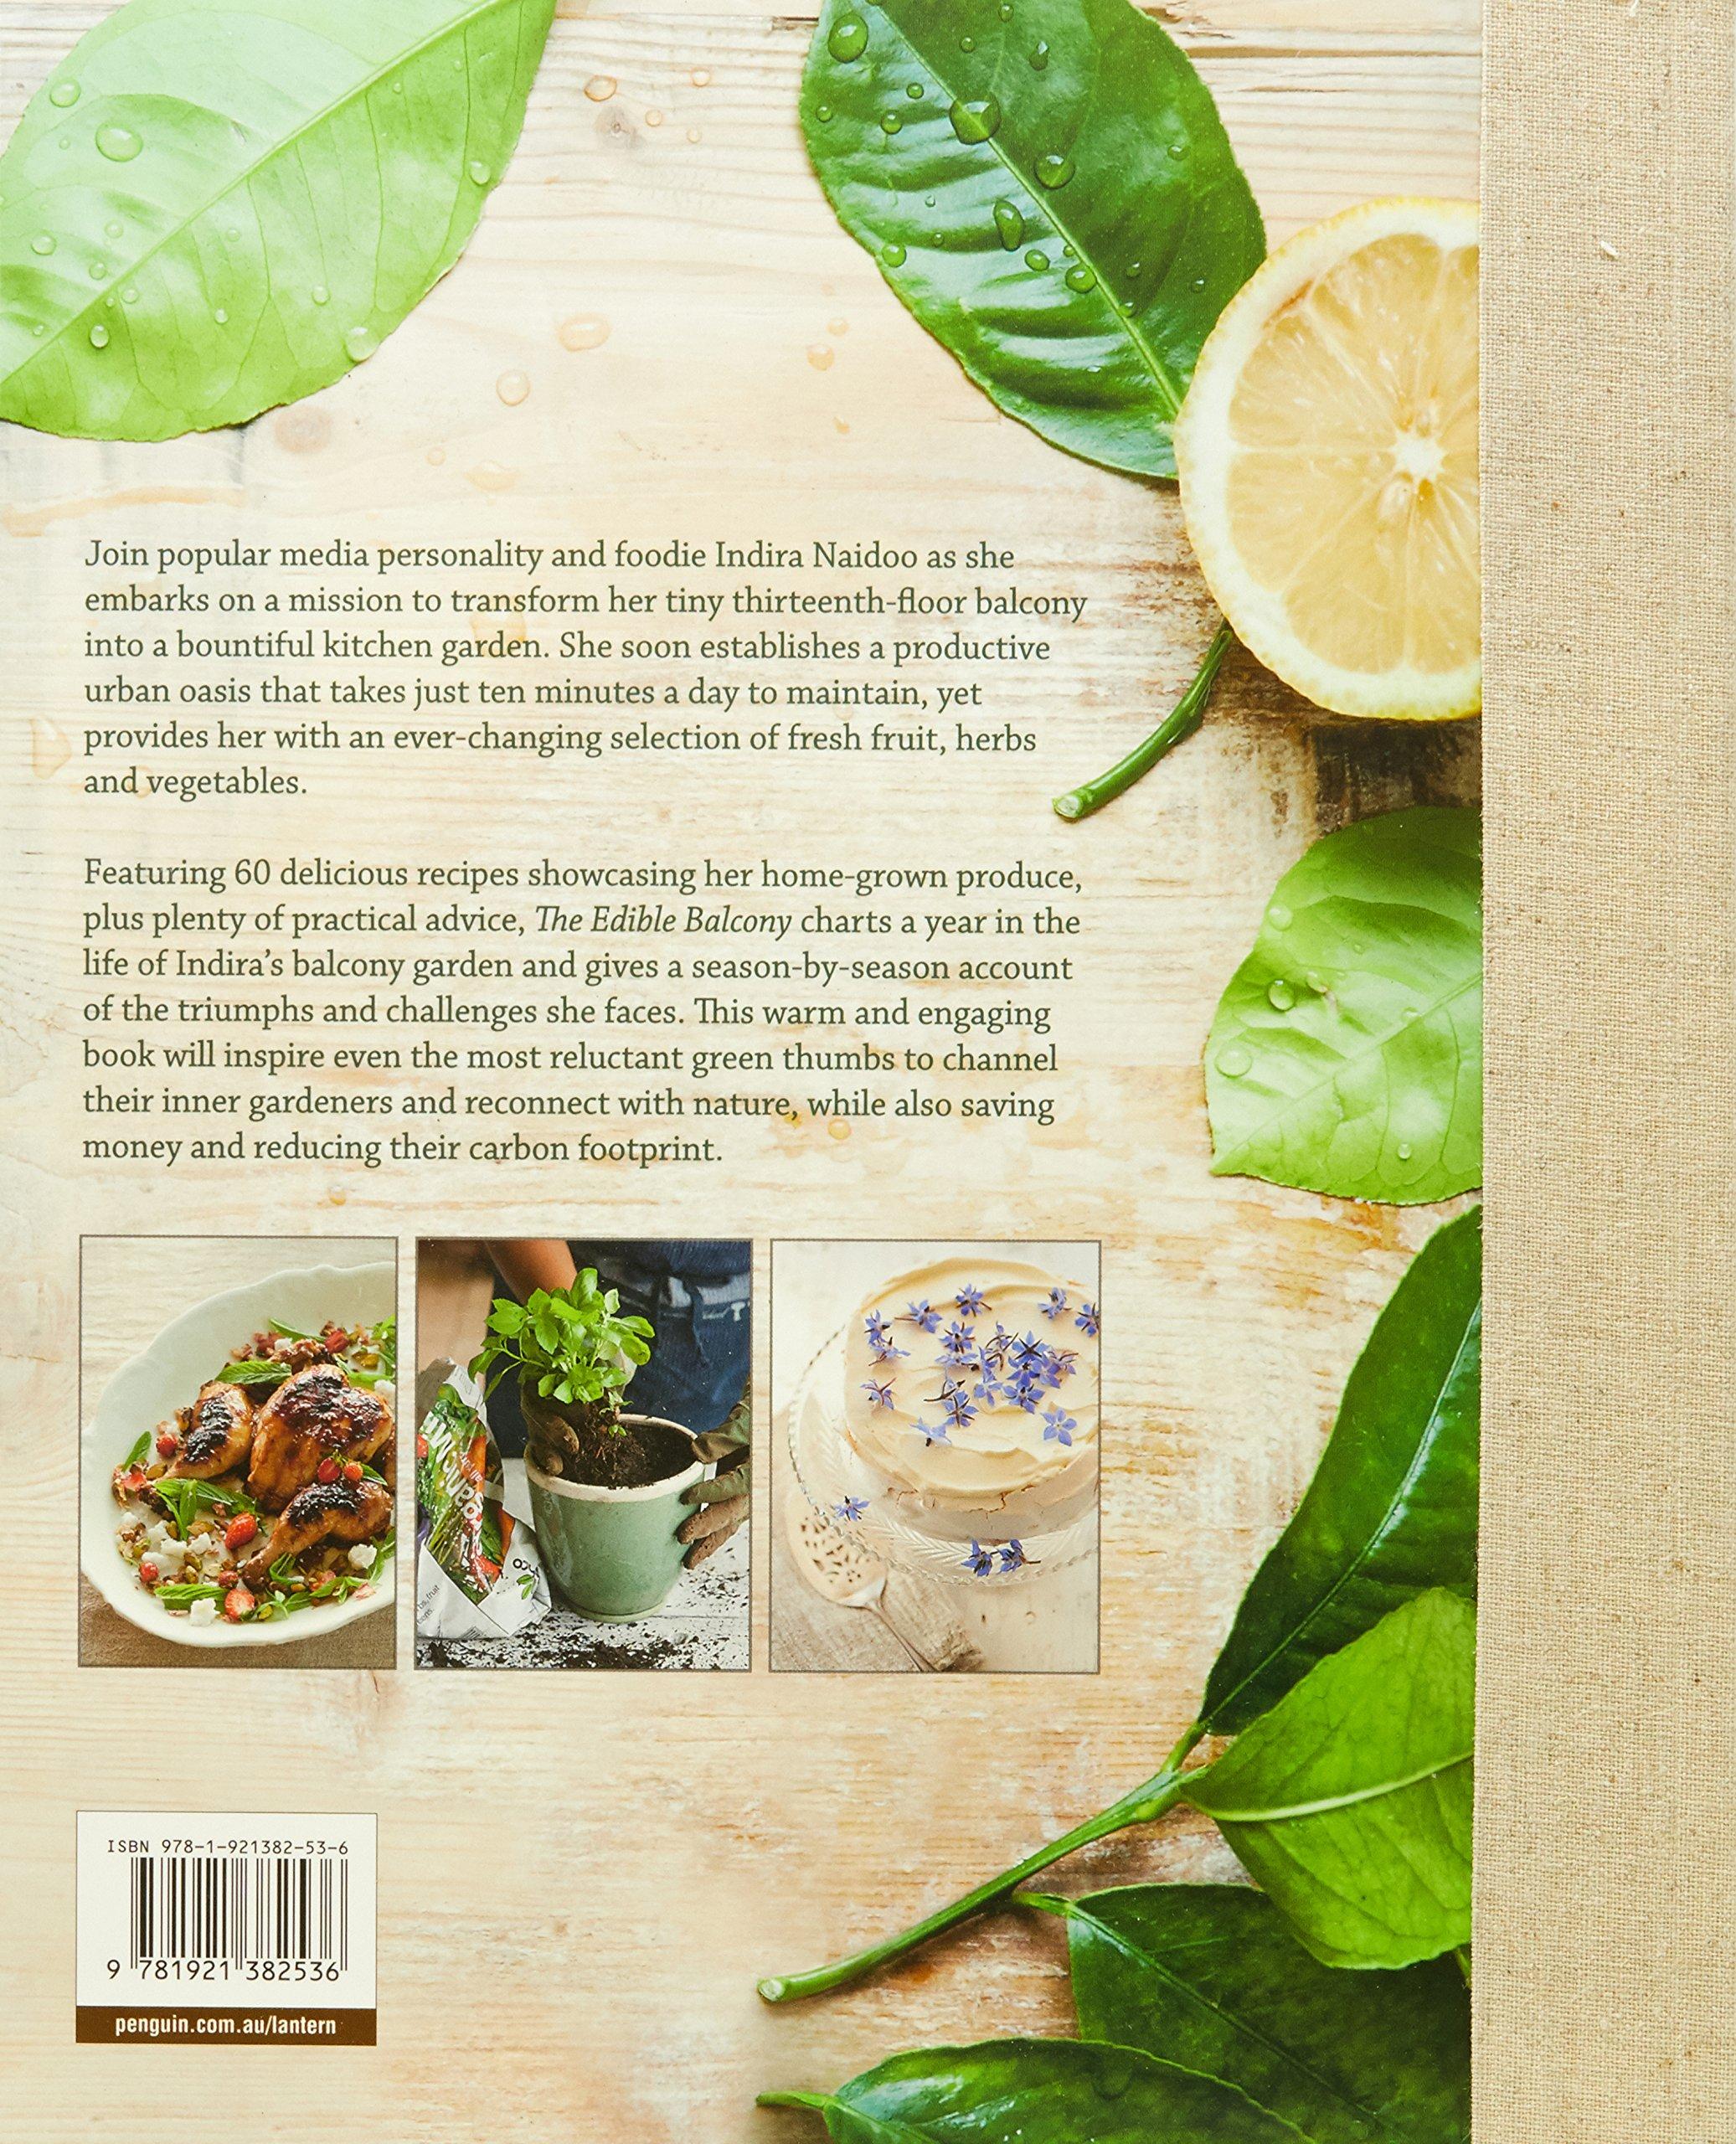 The Edible Balcony: Indira Naidoo: 9781921382536: Amazon.com: Books